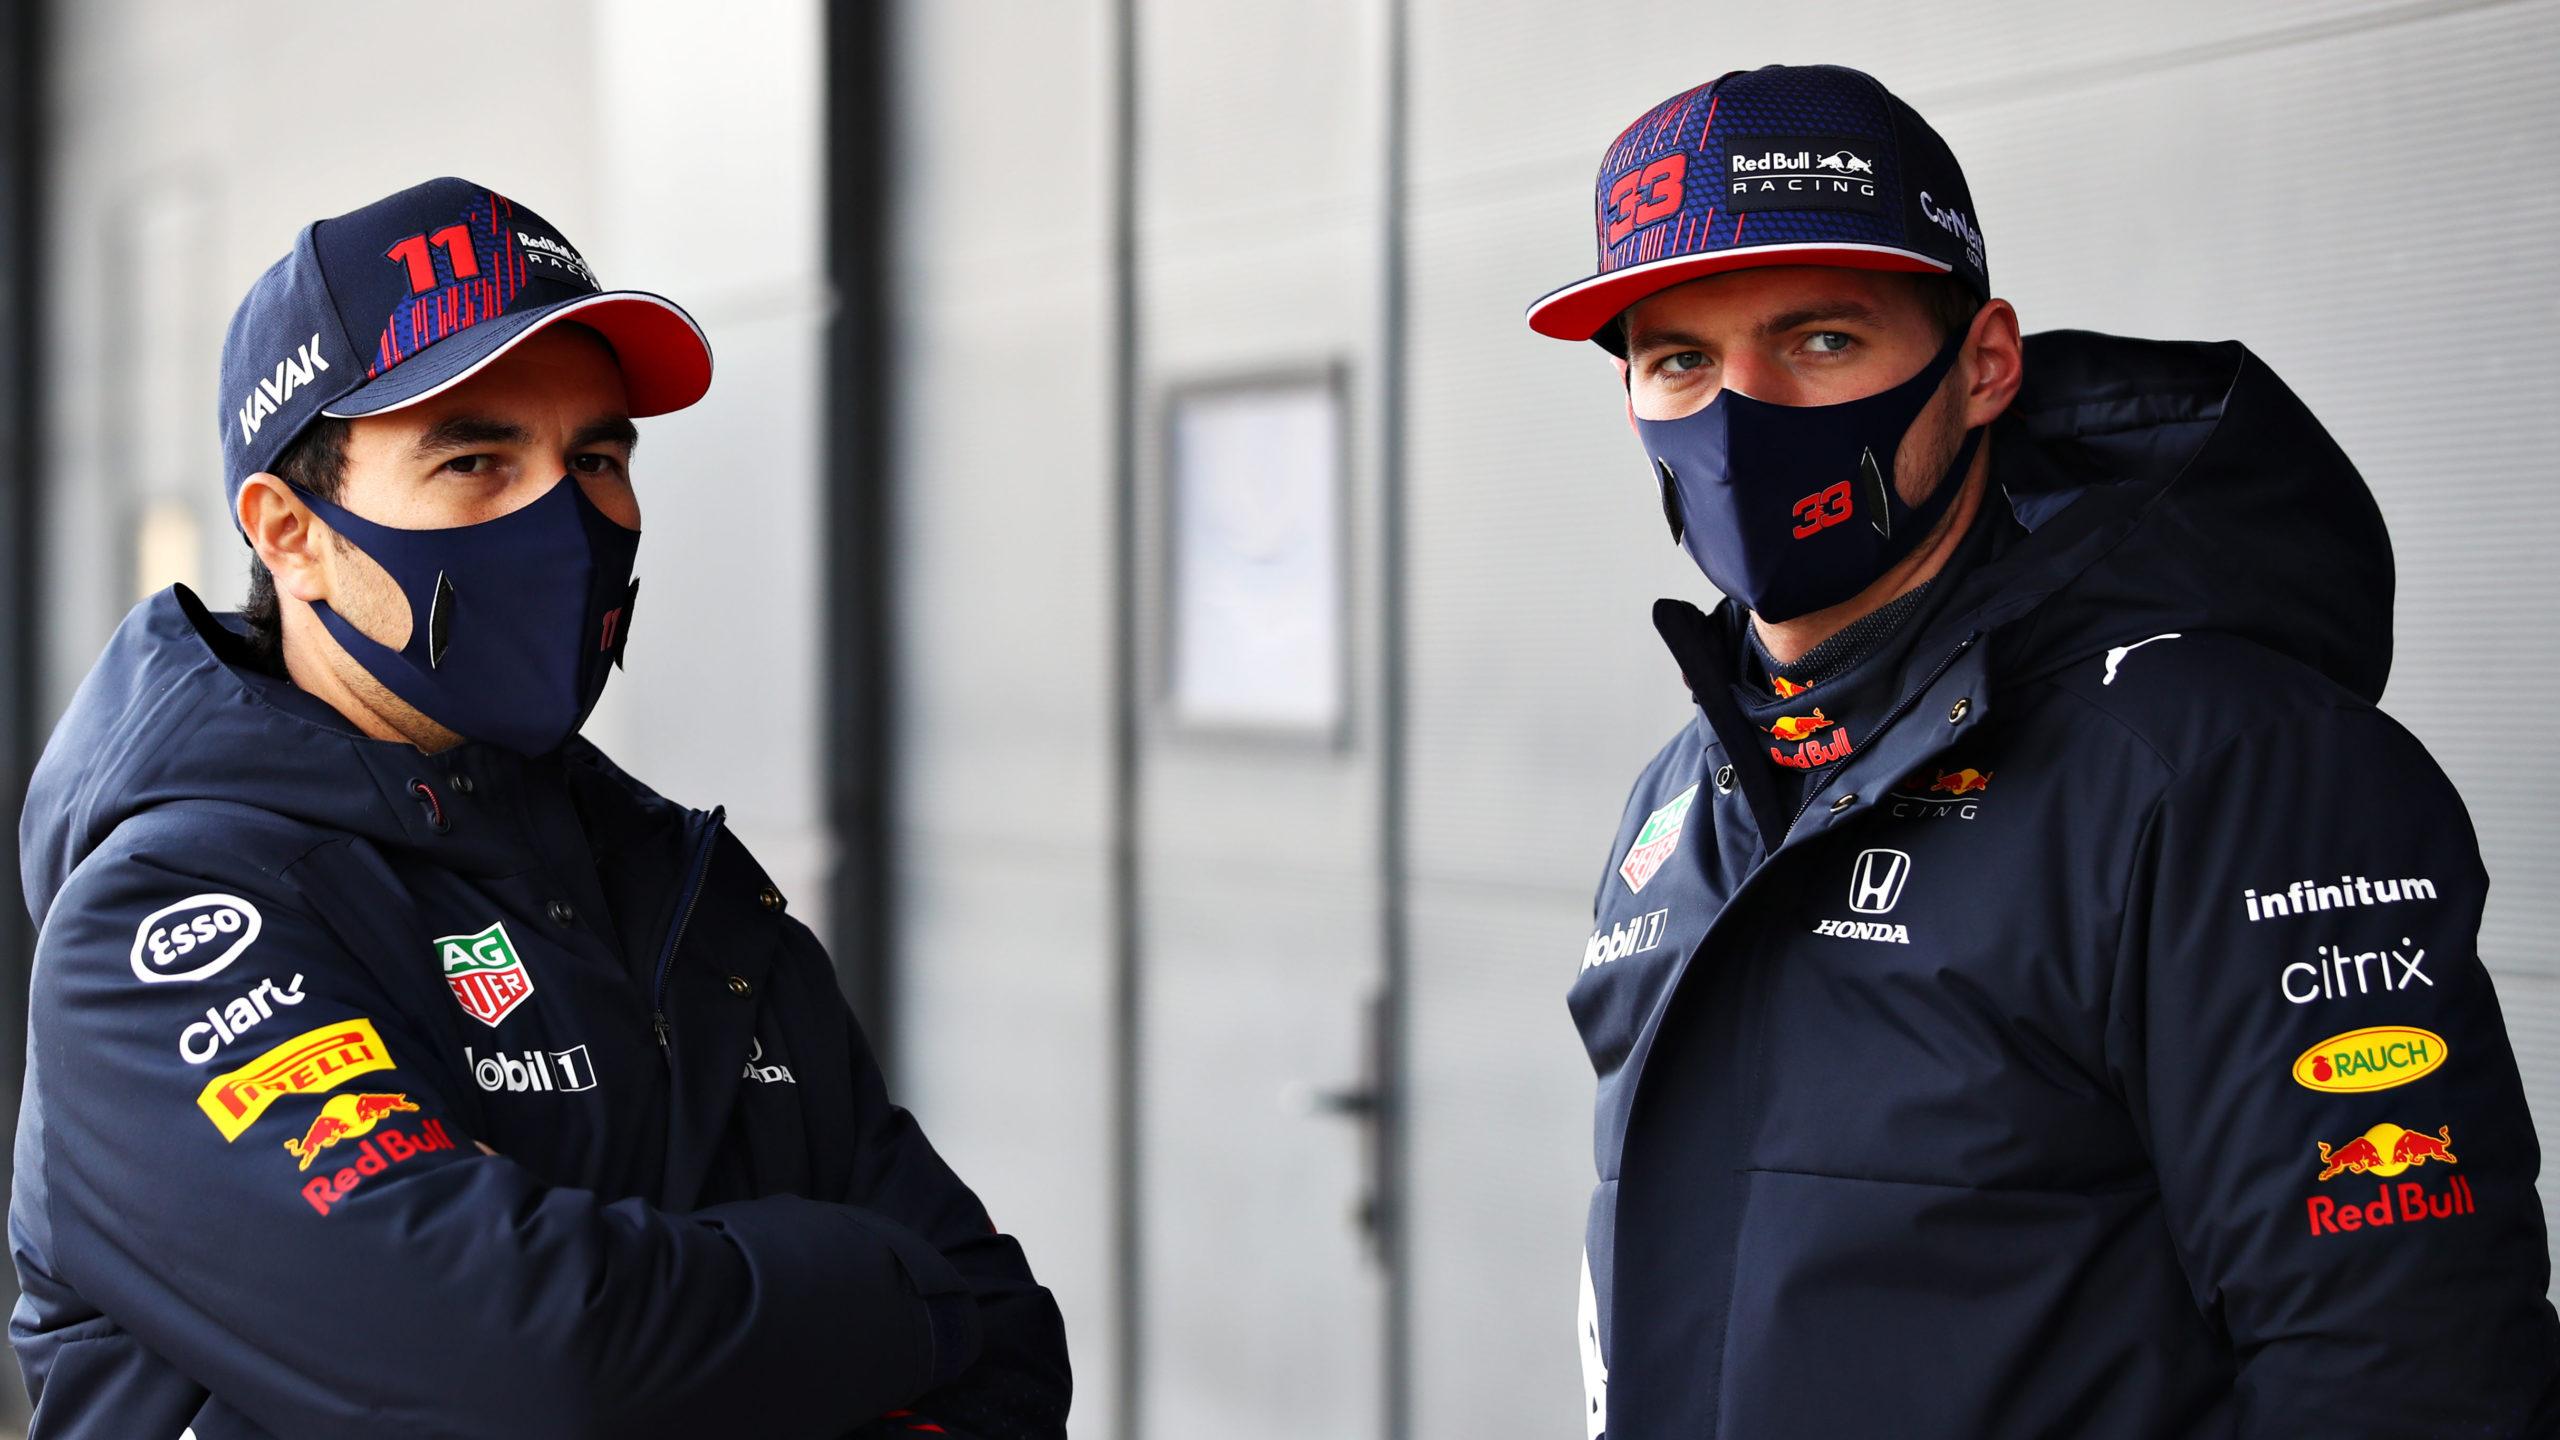 Sergio-Perez-with-Max-Verstappen-in-2021